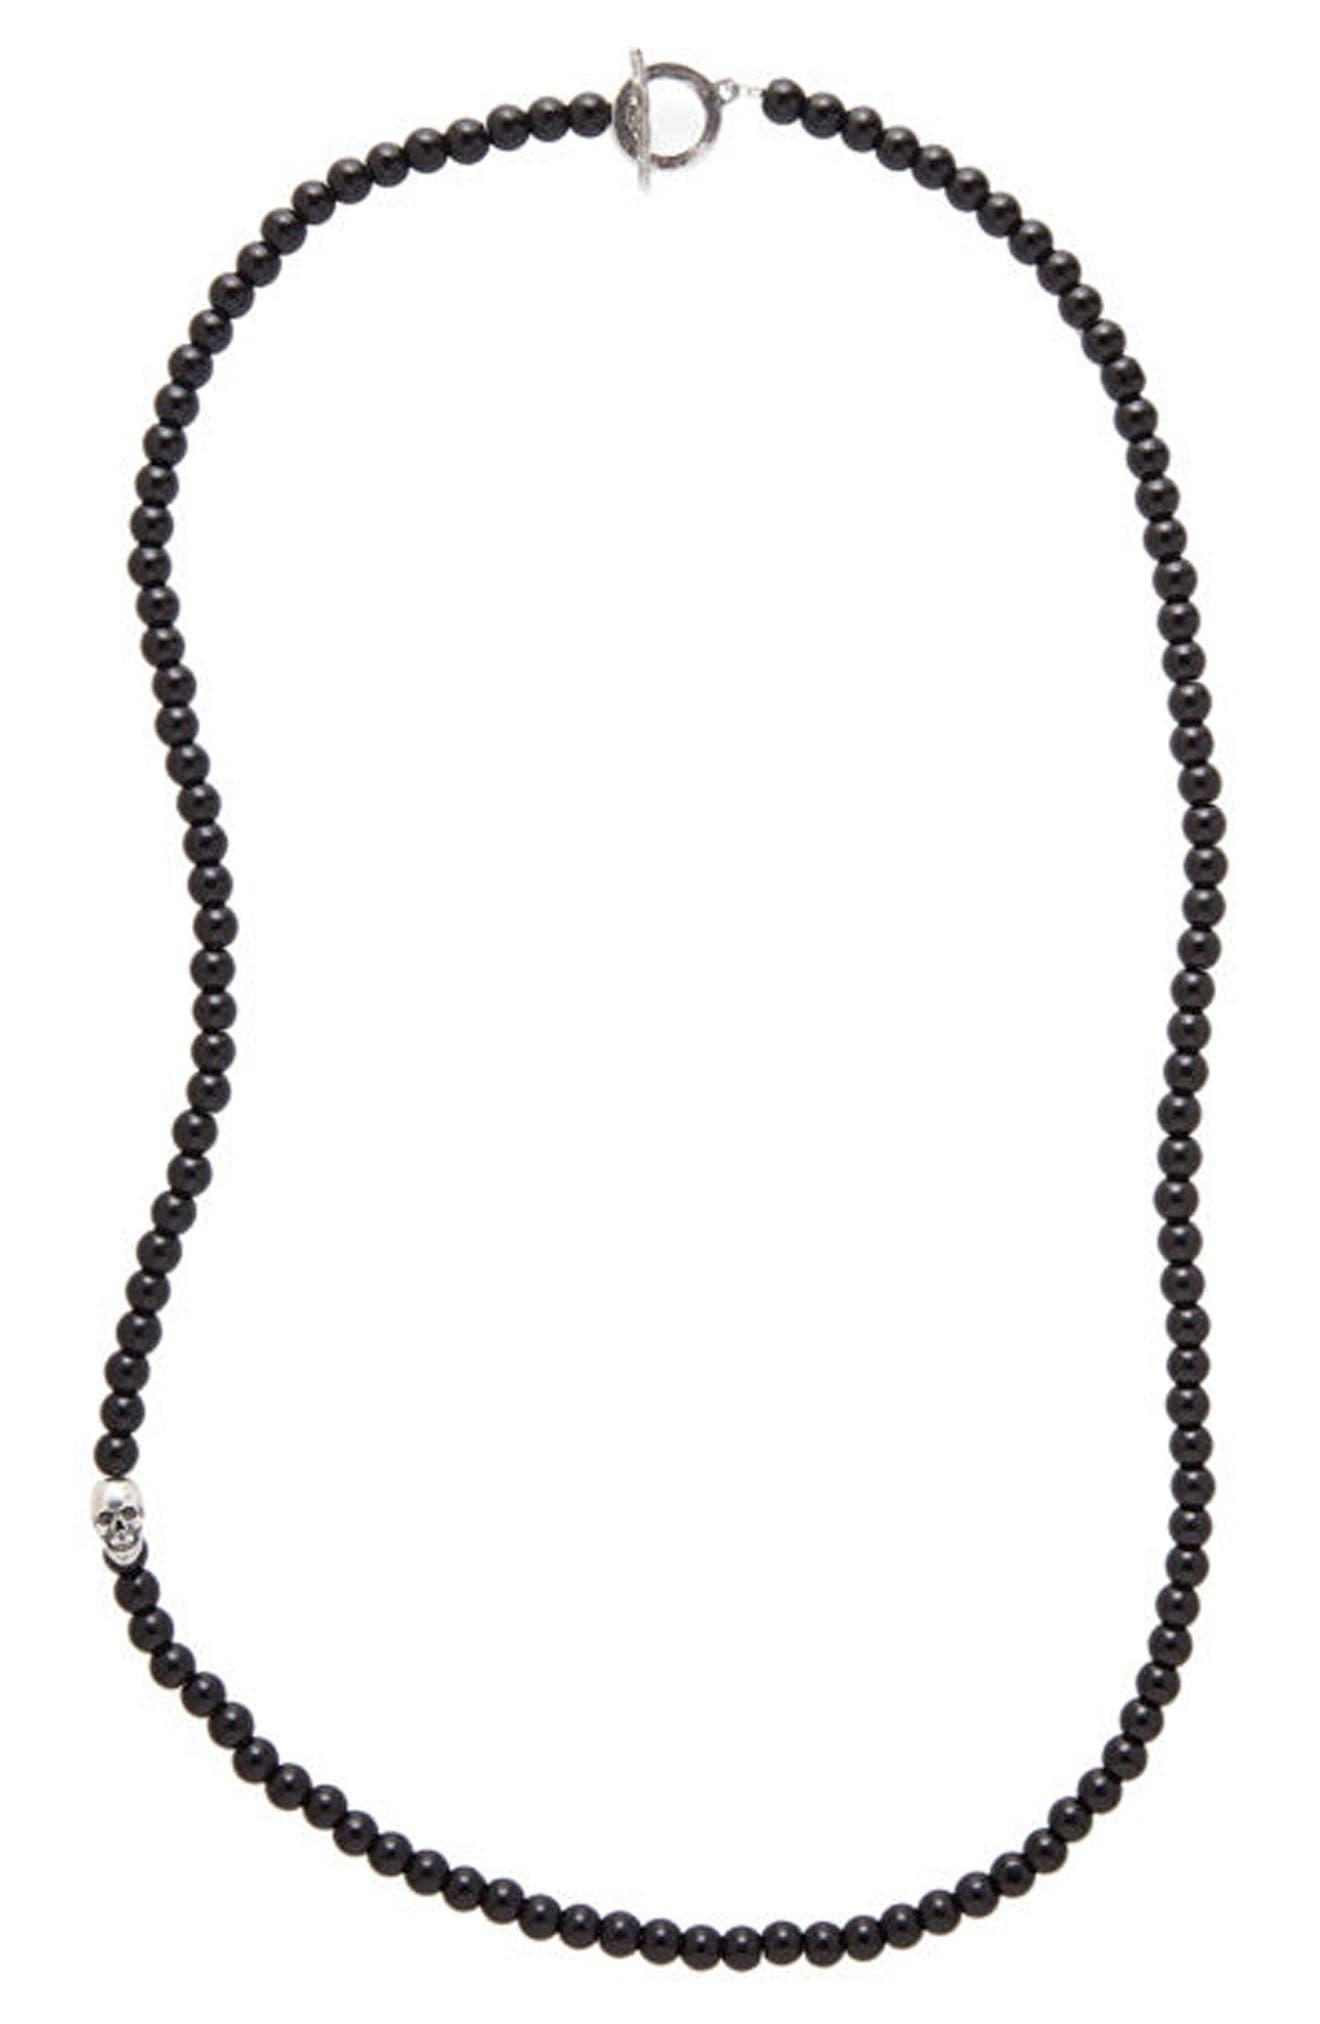 Onyx Bead Necklace,                             Main thumbnail 1, color,                             BLACK